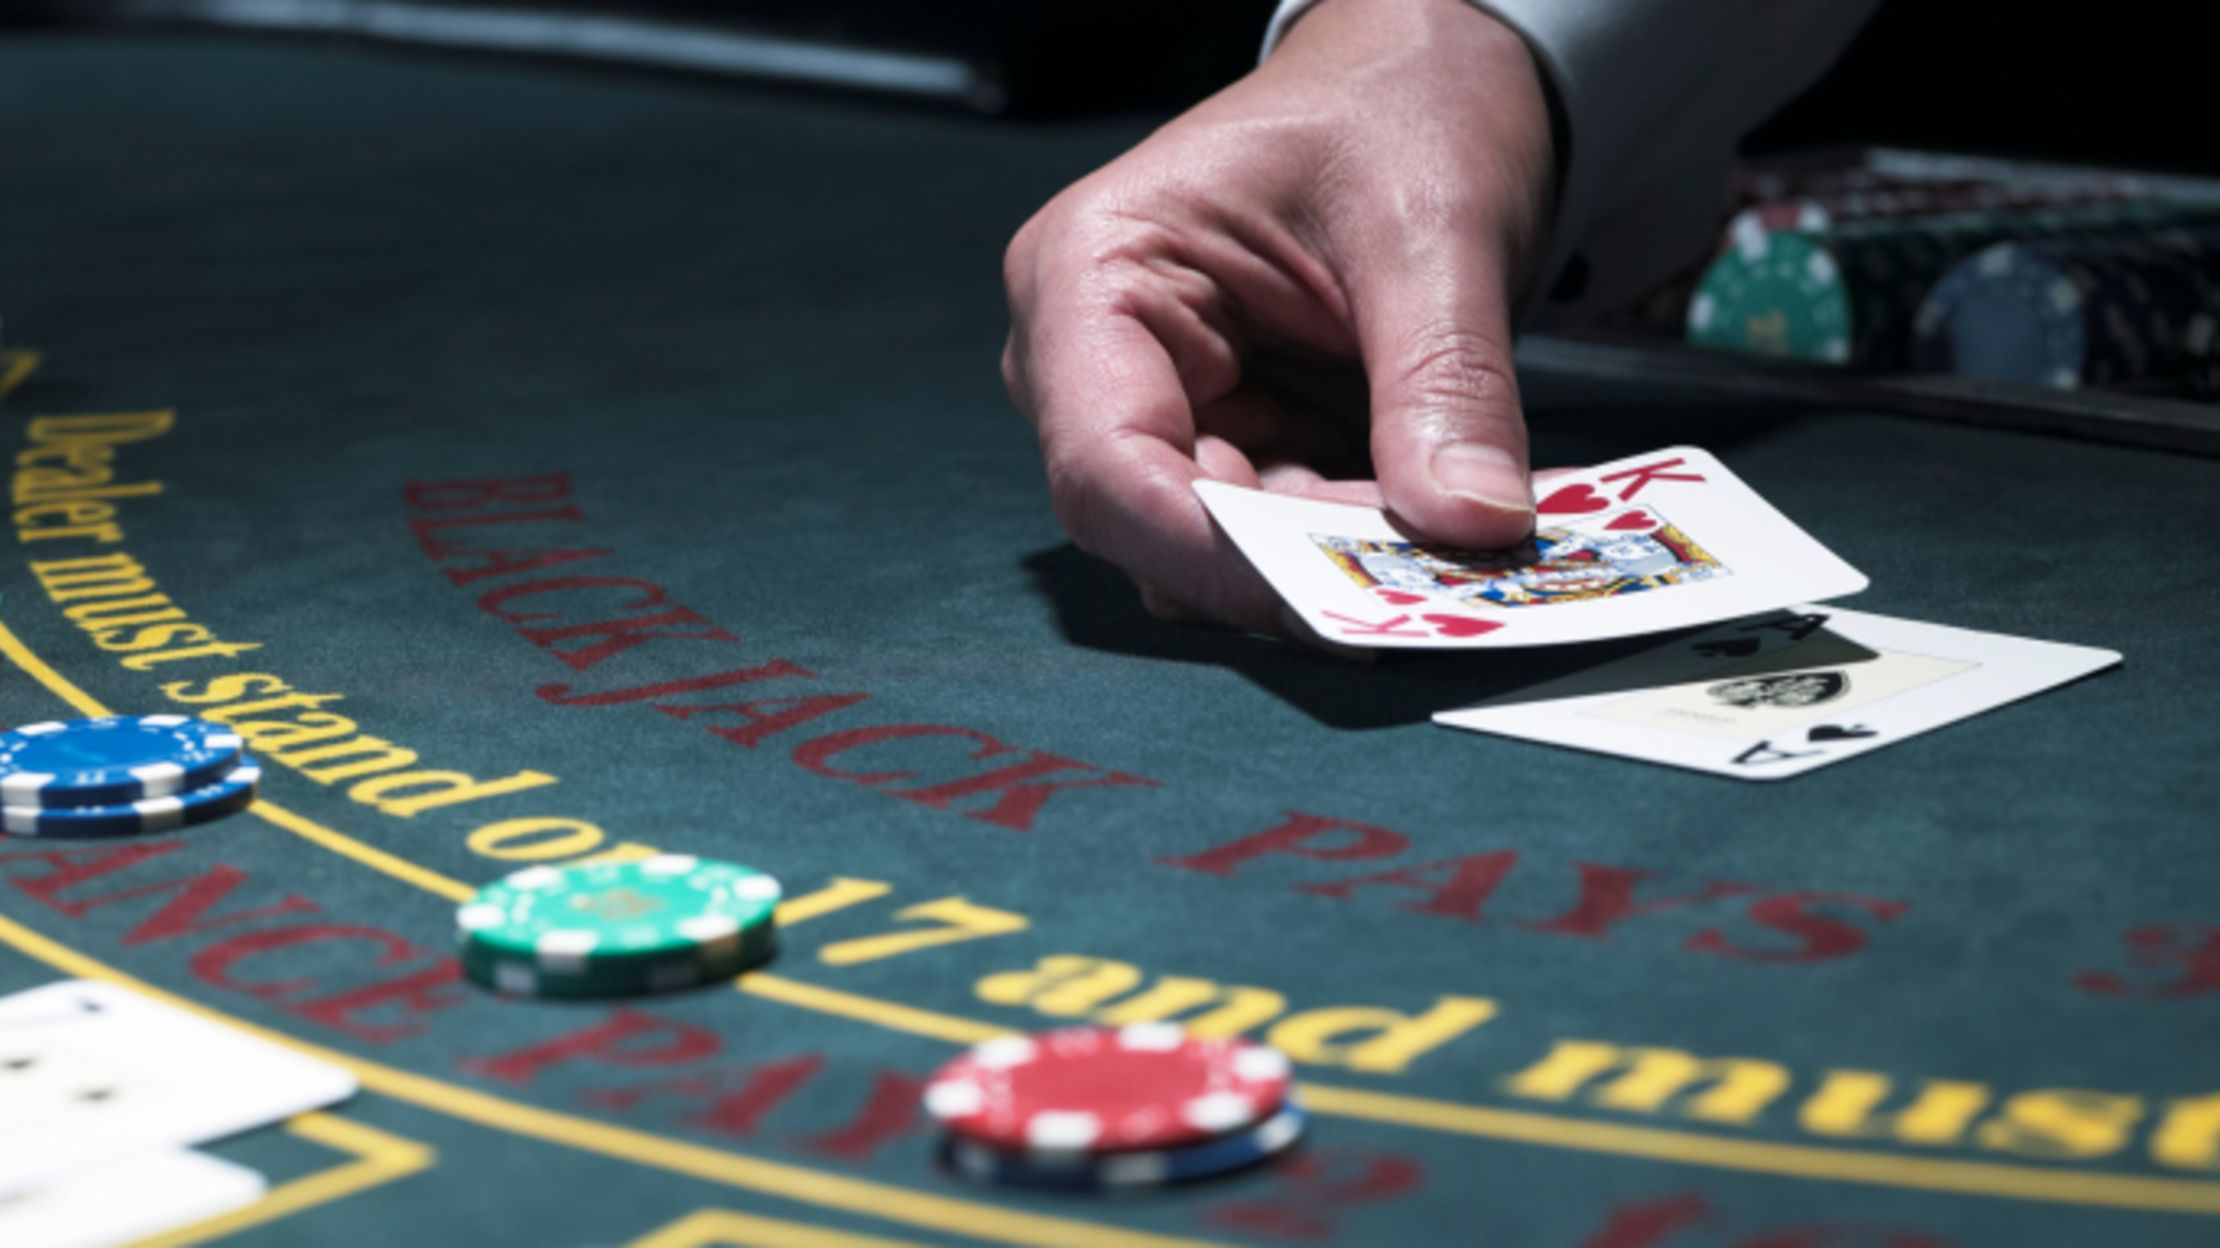 How Does Insurance Work In Blackjack